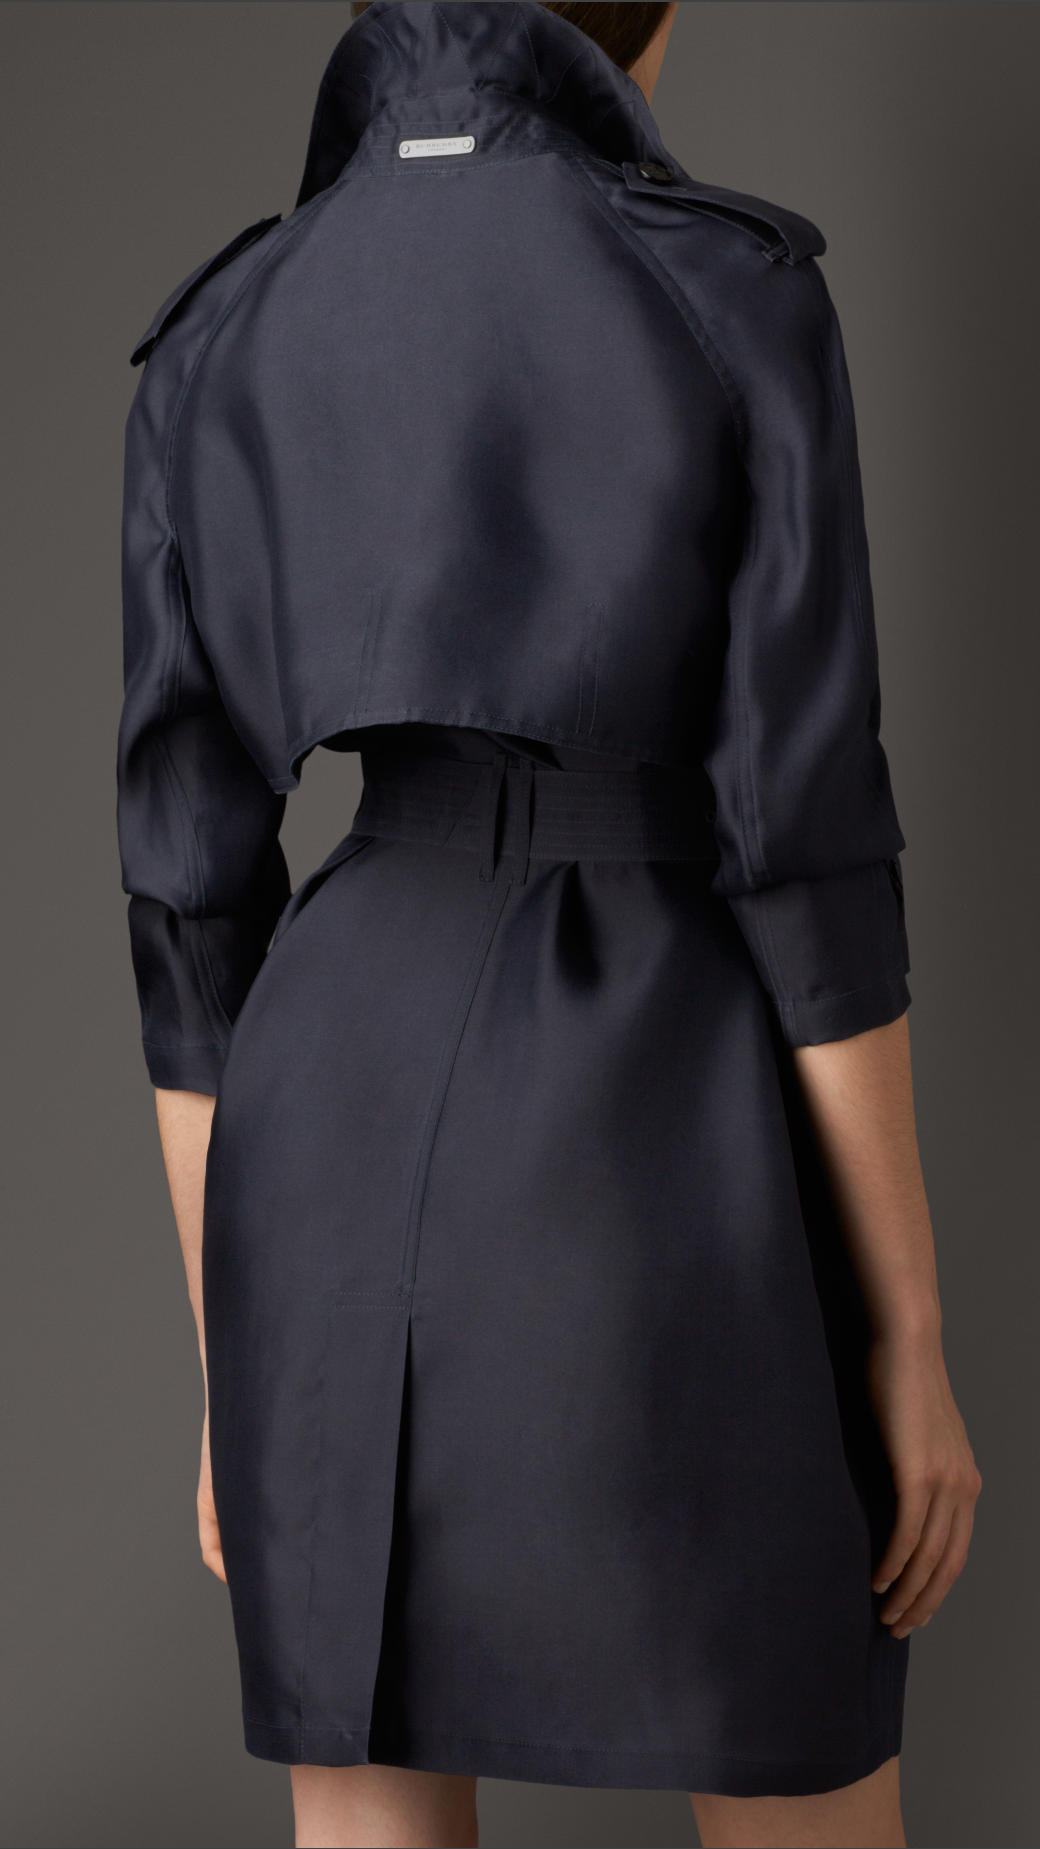 burberry long showerproof silk trench coat in blue lyst